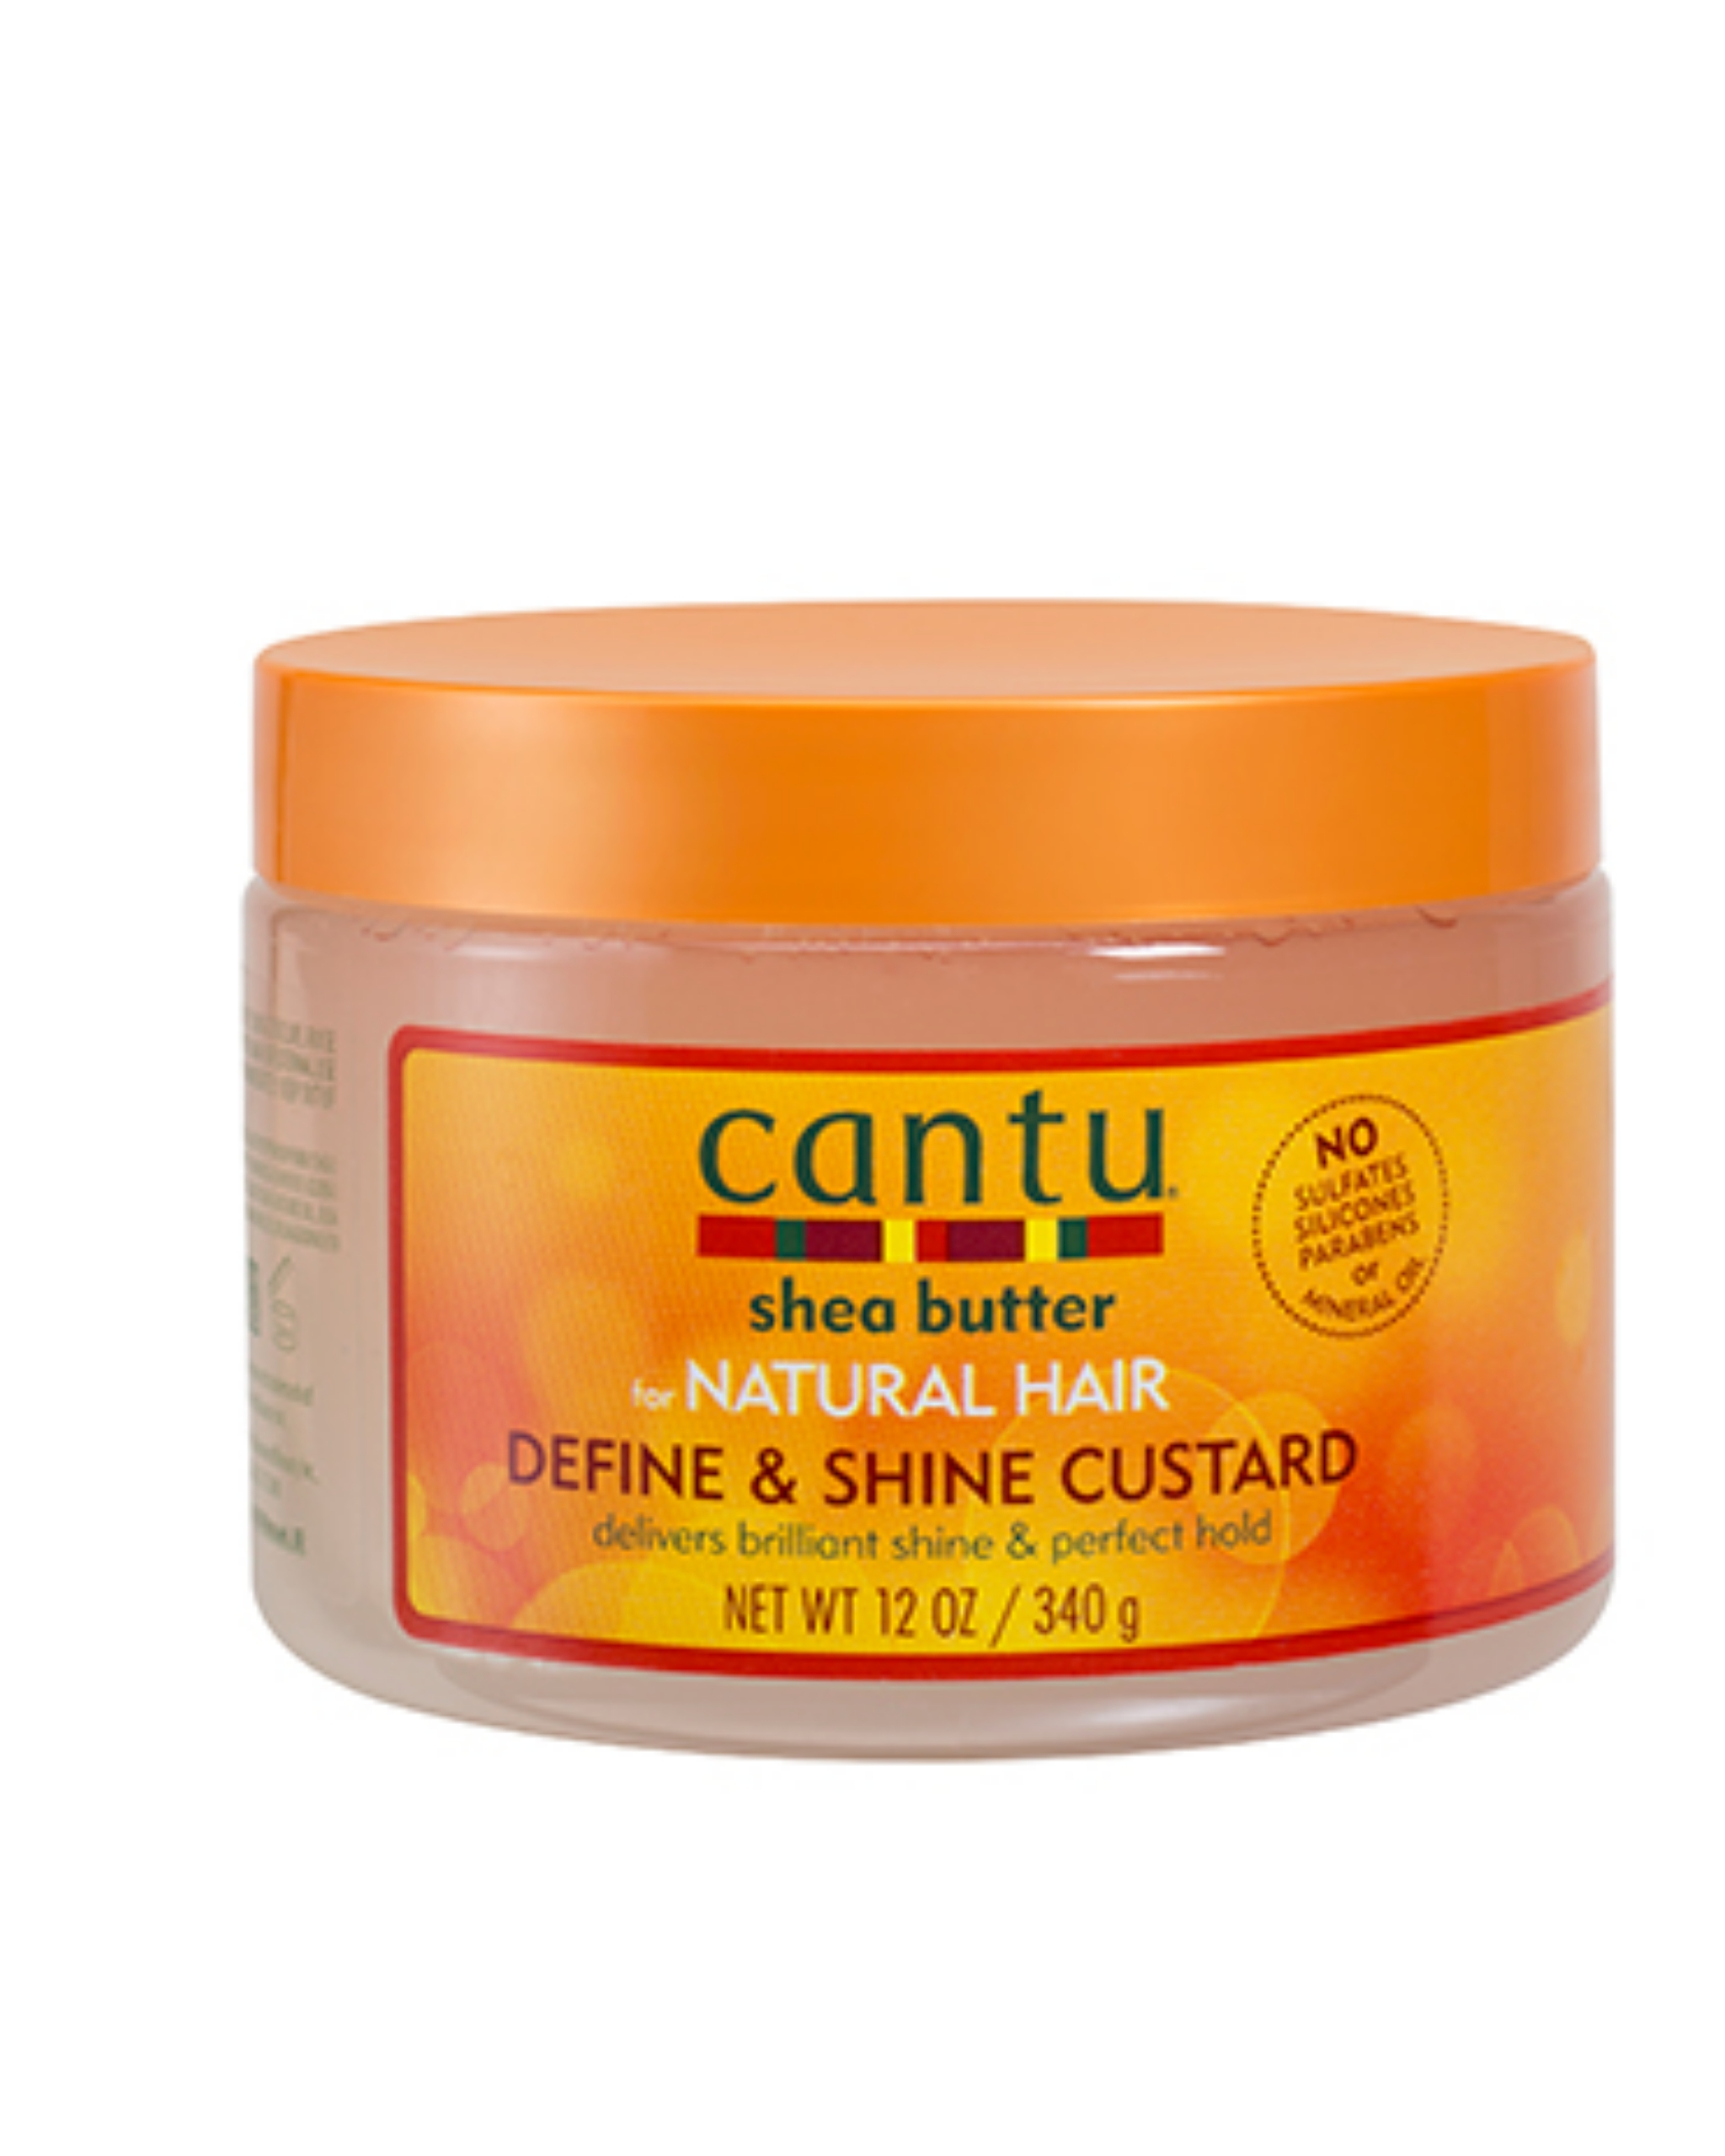 Cantu Shea Butter for Natural Hair Define & Shine Custard 12oz